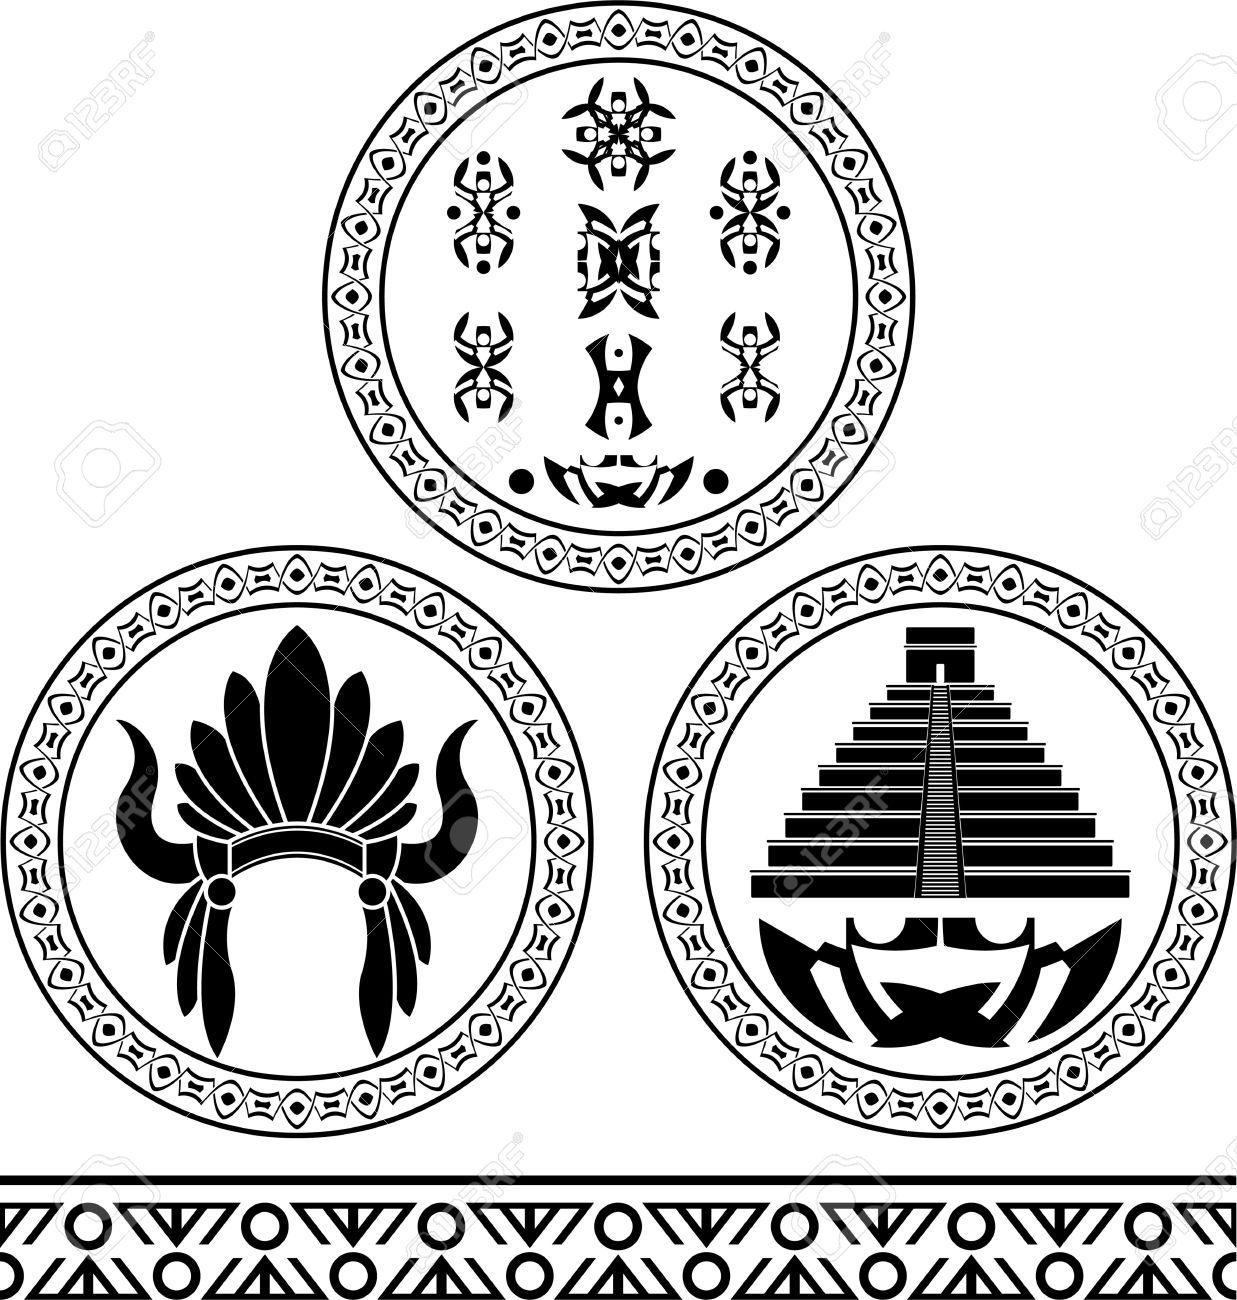 Mayan Signs Headdress Pyramid And Pattern Stencils Illustration